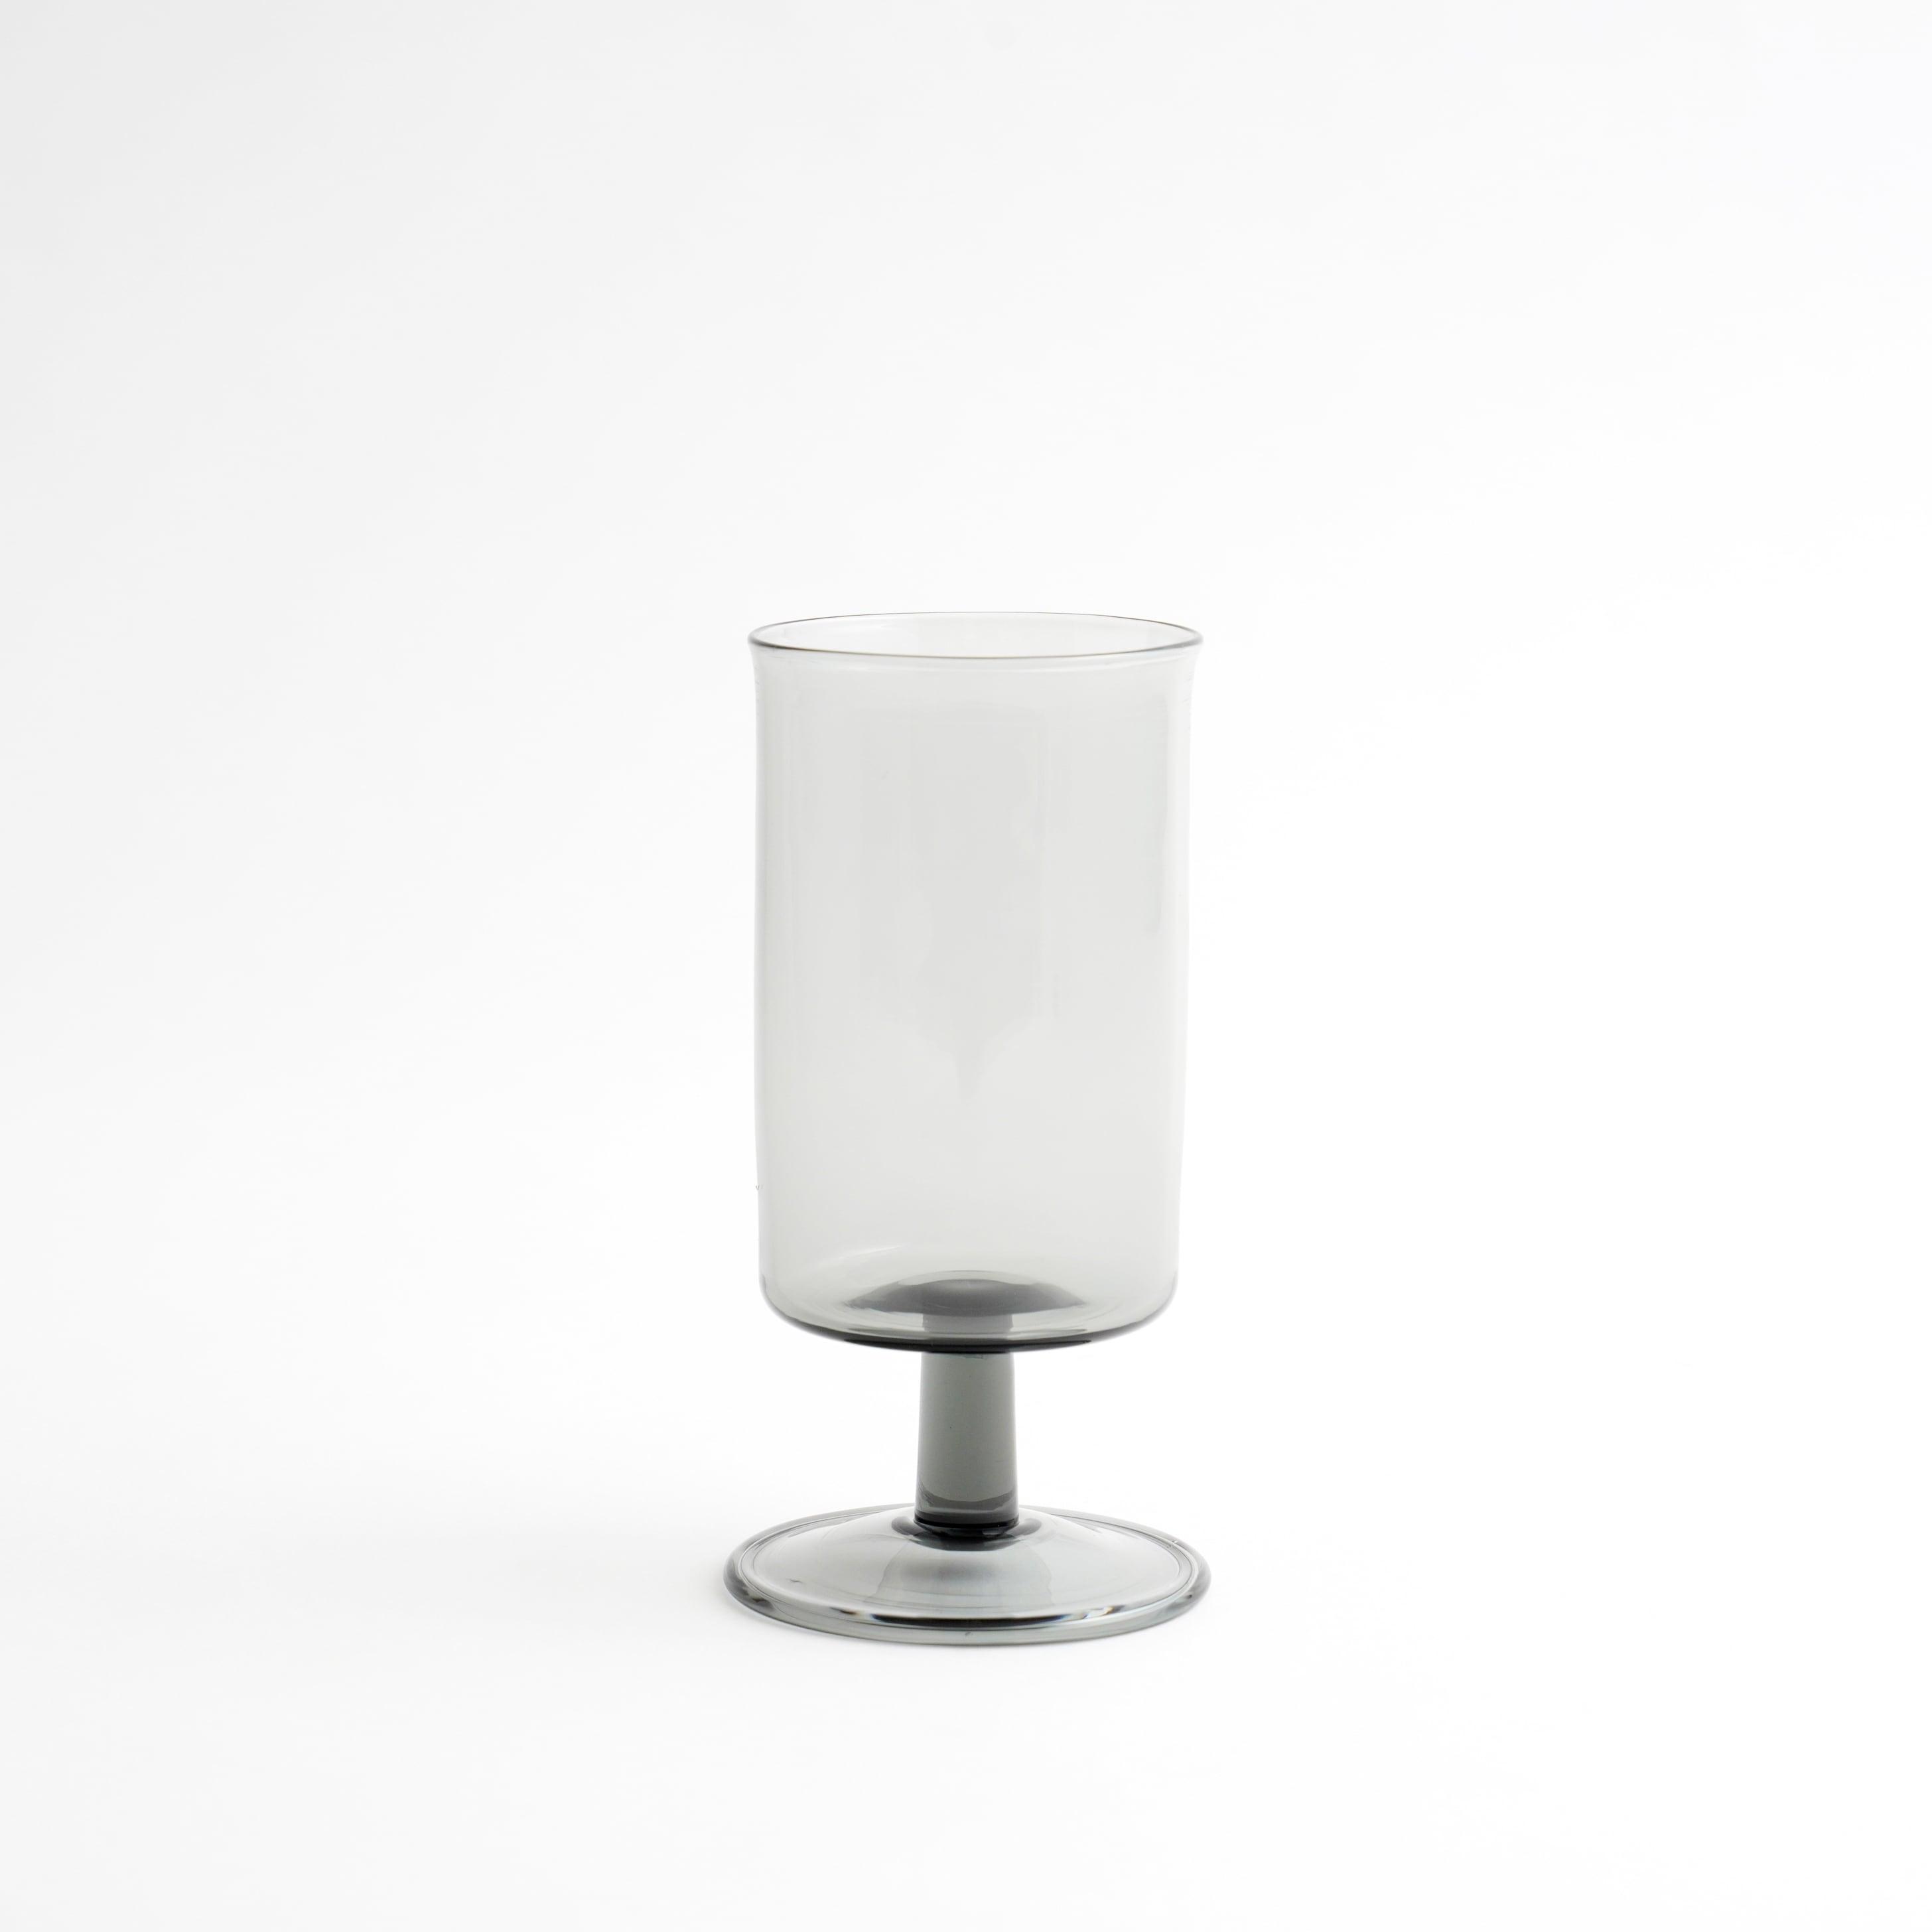 RITOGLASS/アイスコーヒーグラス/グレー